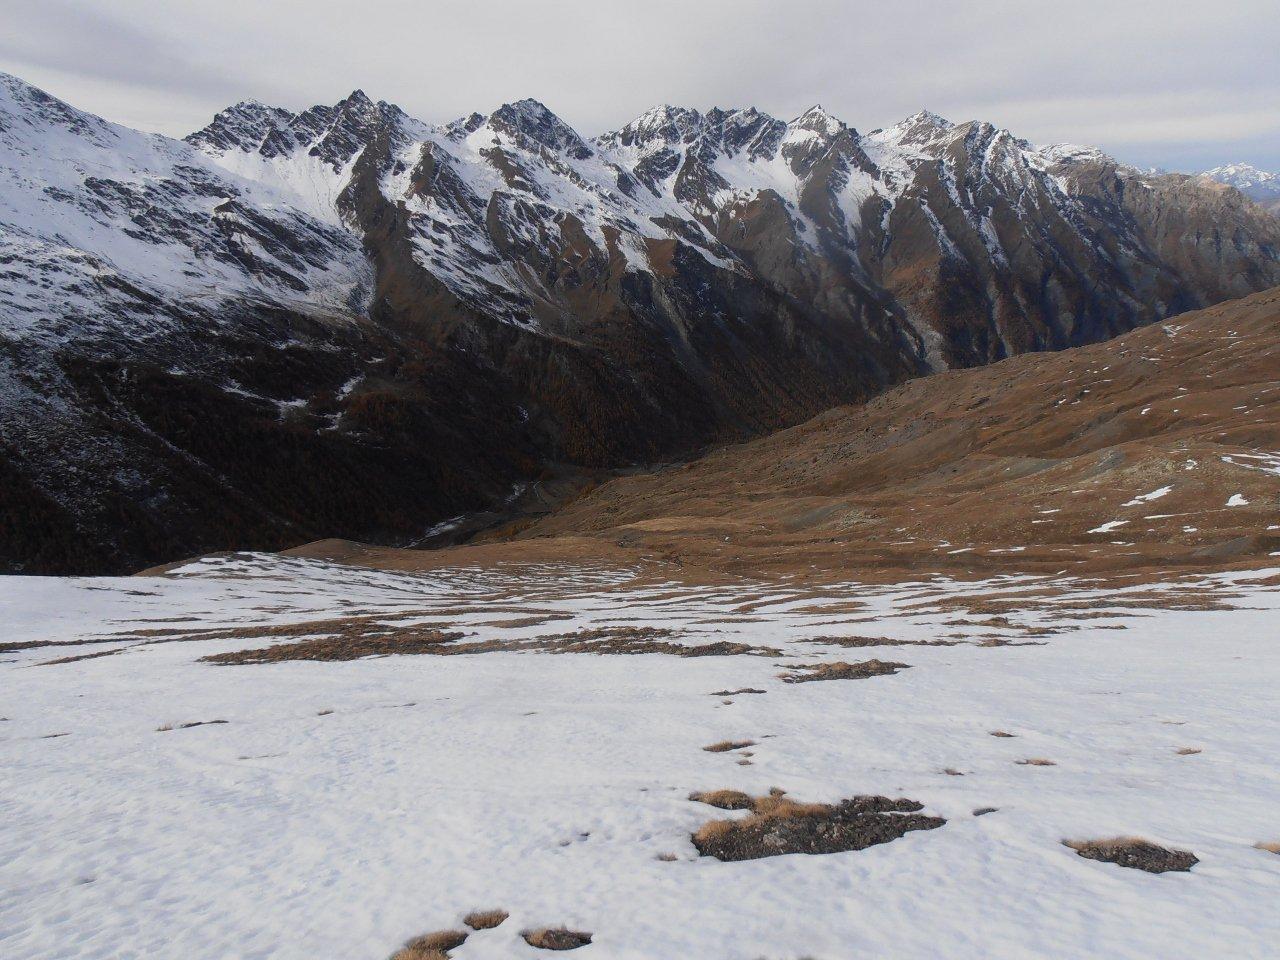 07 - neve continua dai 2700 circa, lingue di neve fino ai 2600